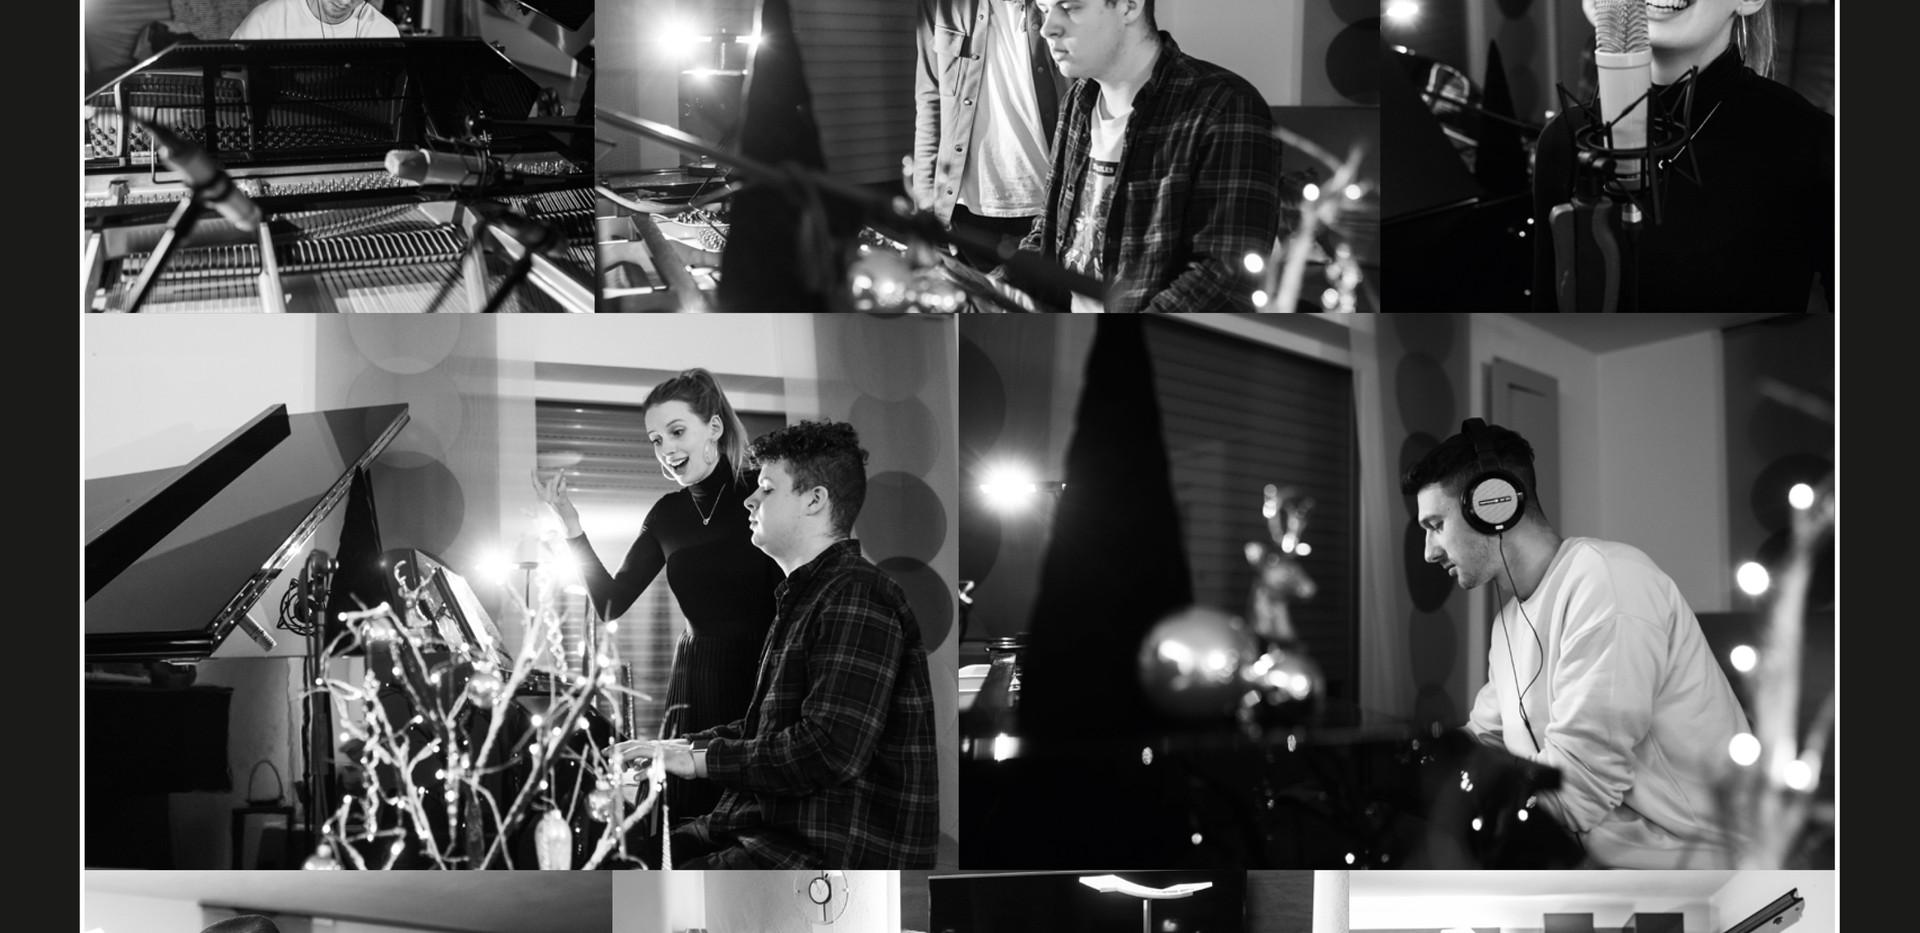 MMXX Behind the scenes